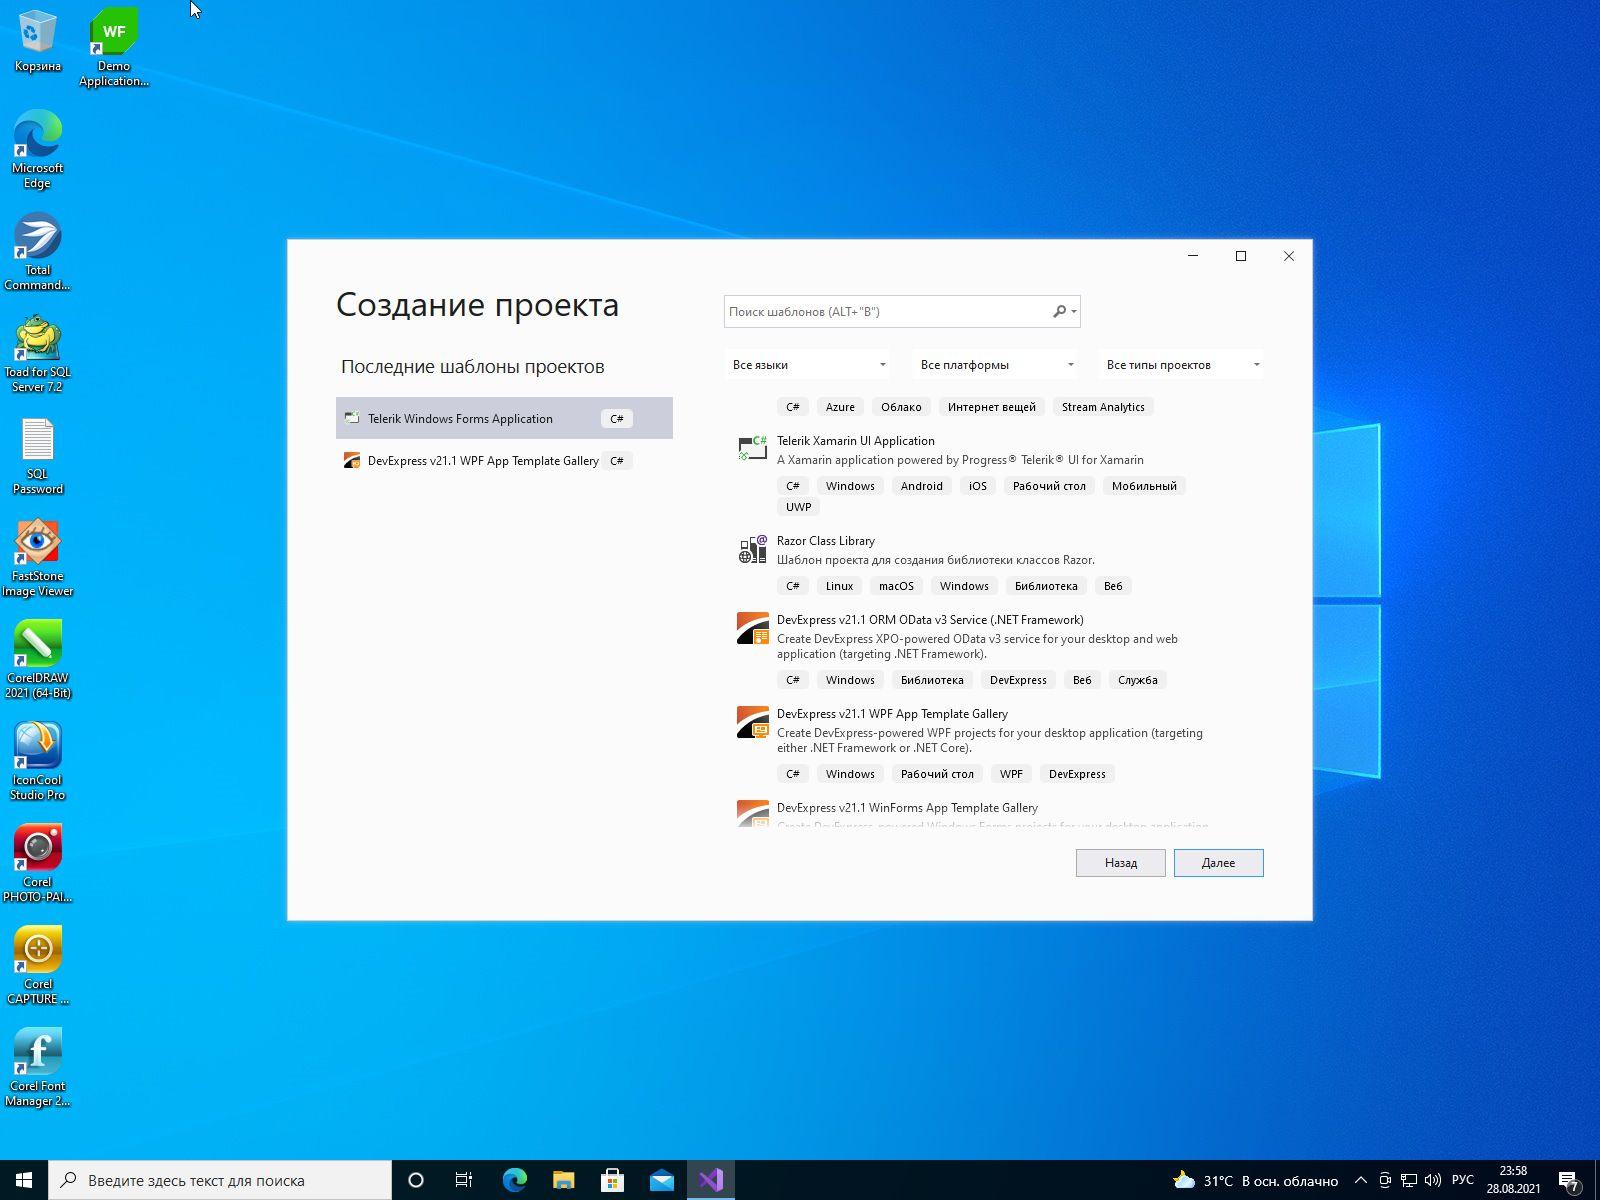 Windows 10 Pro + Visual Studio 2019 x64 Rus 08.2021